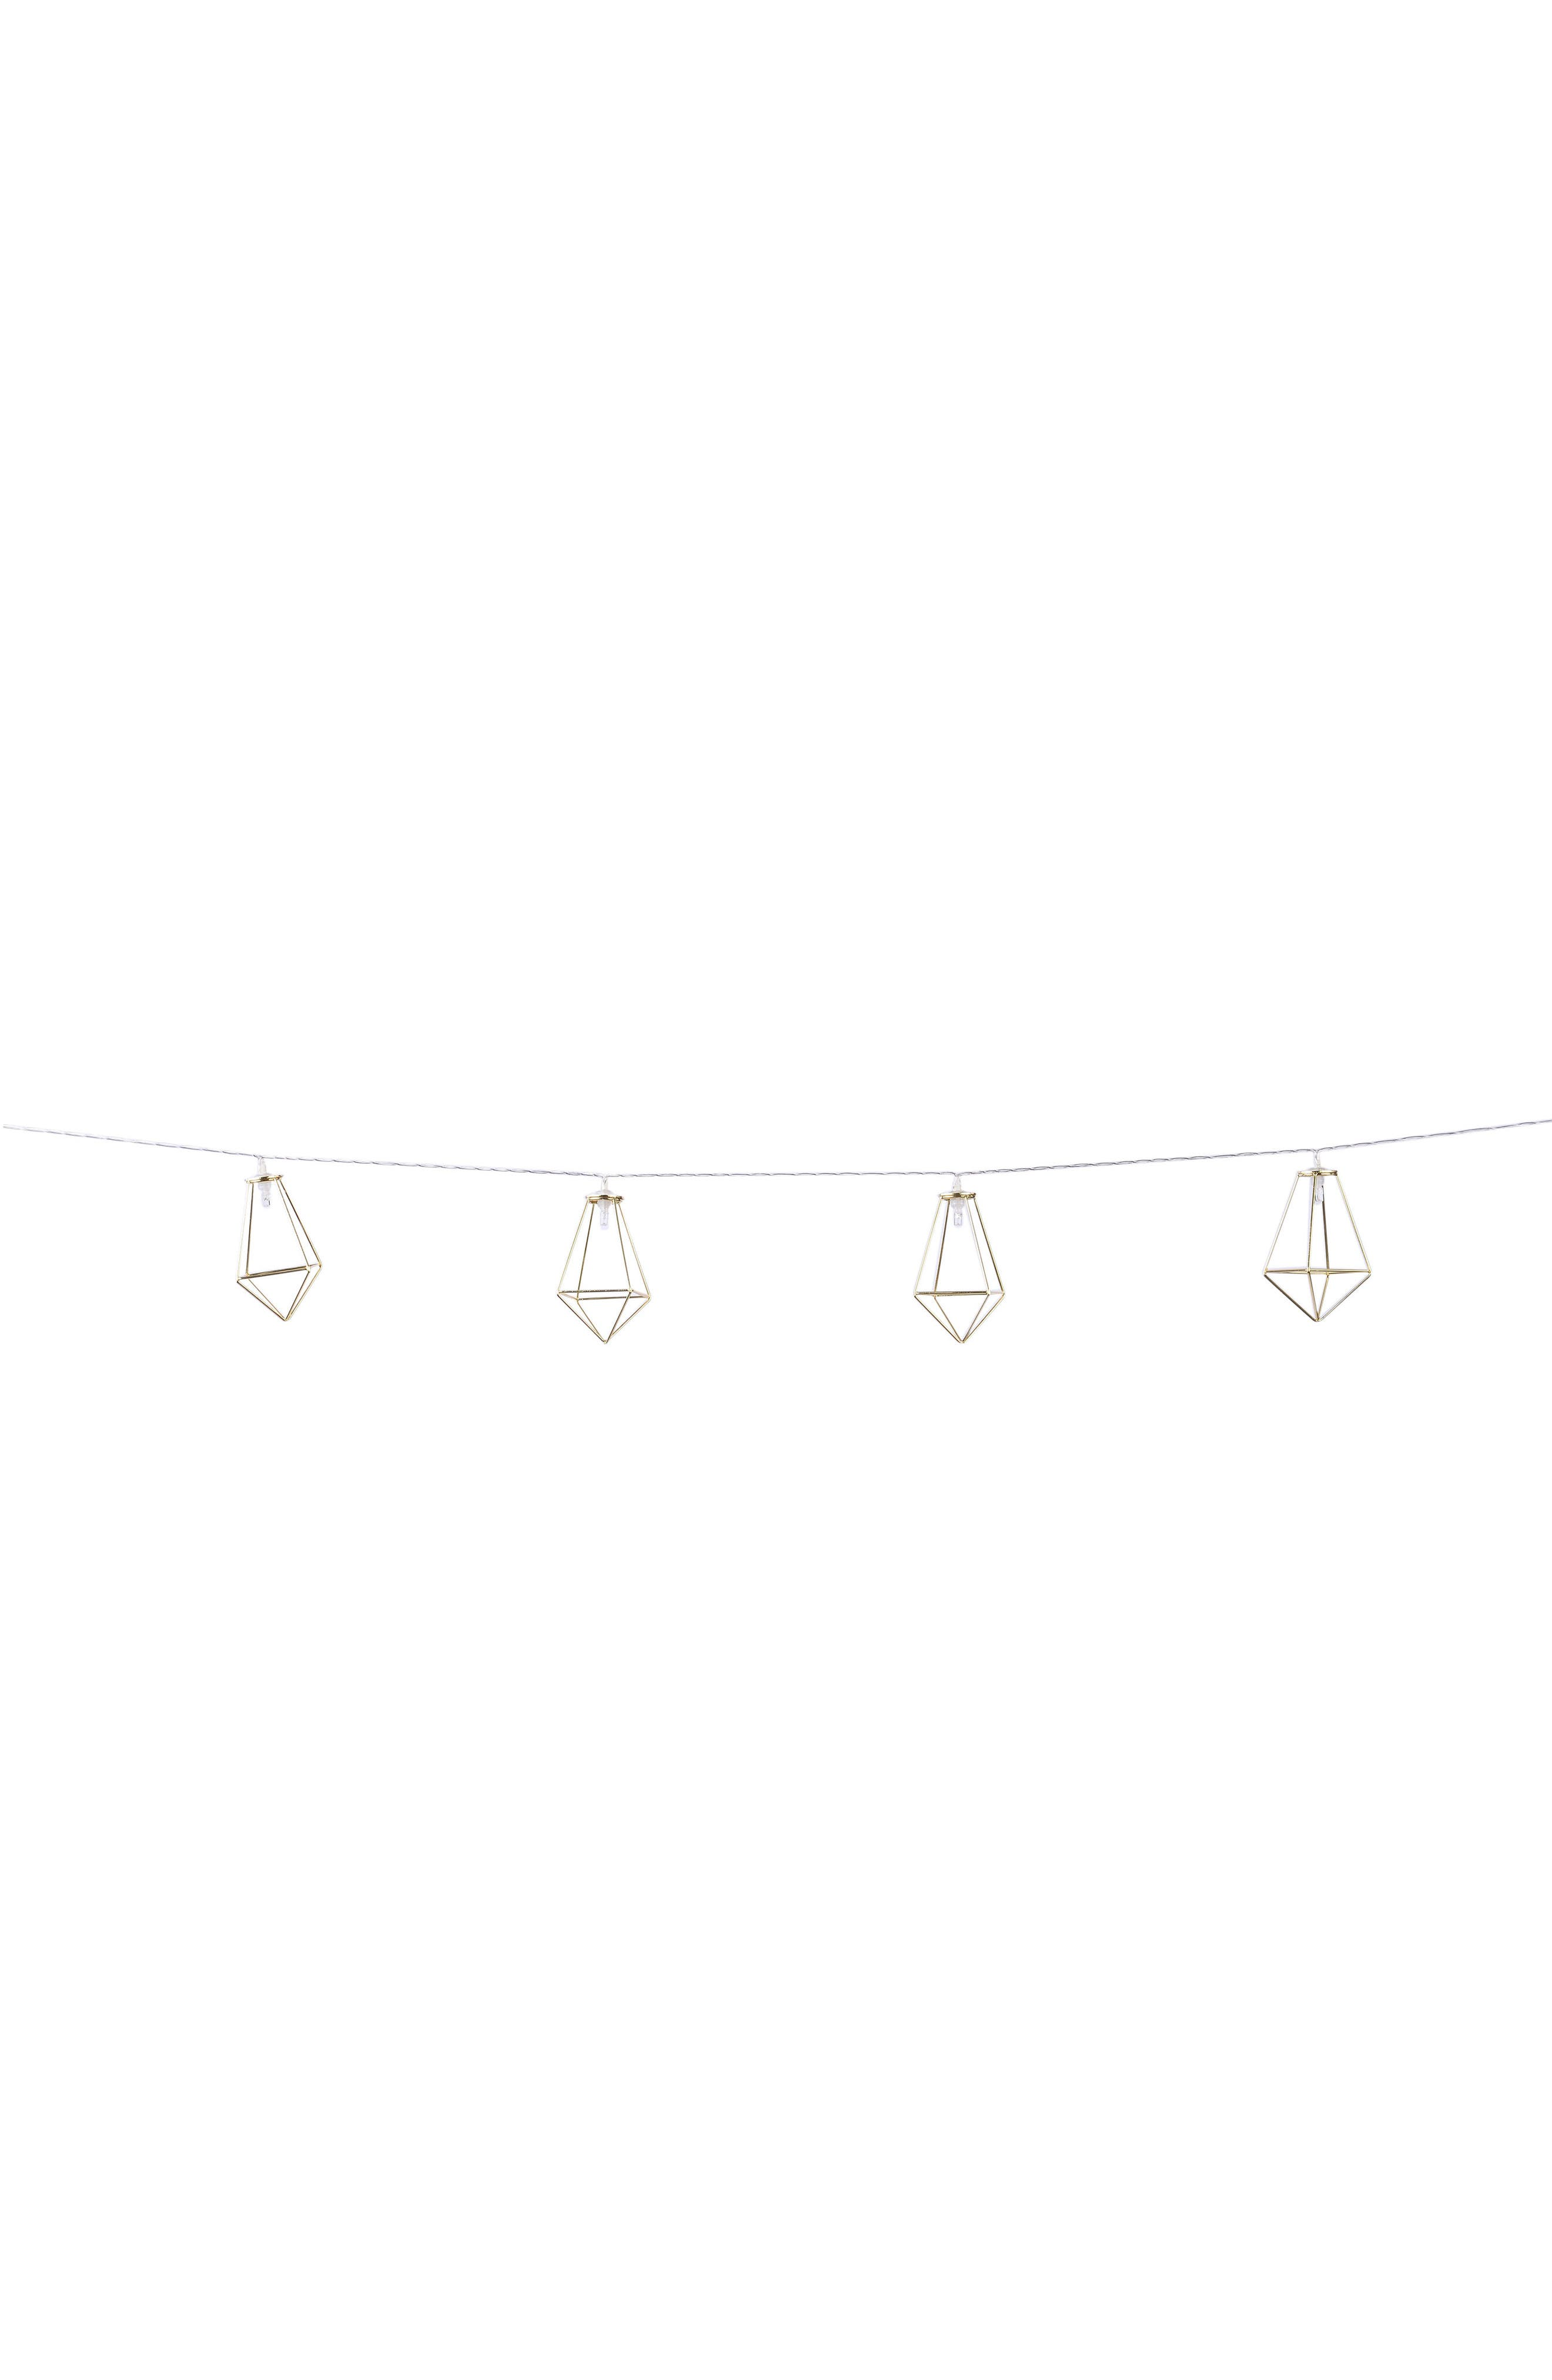 JAlexander Quadrangle String Lights,                         Main,                         color, 711